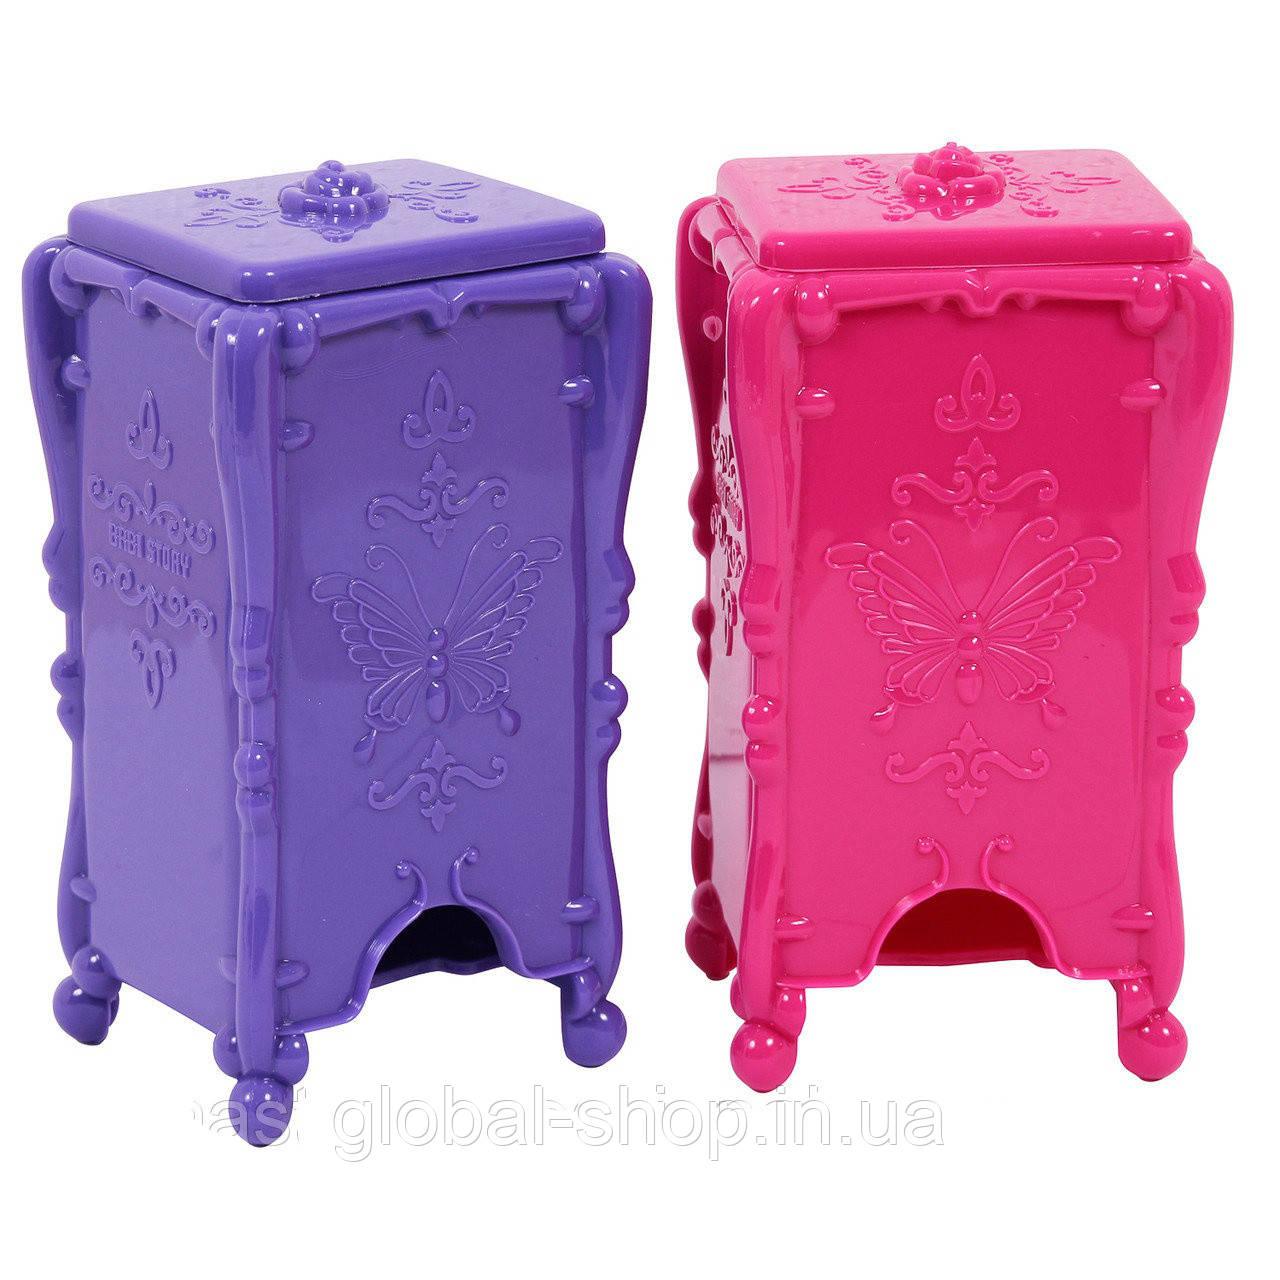 Подставка для безворсовых салфеток,шкафчик для безворсовых салфеток